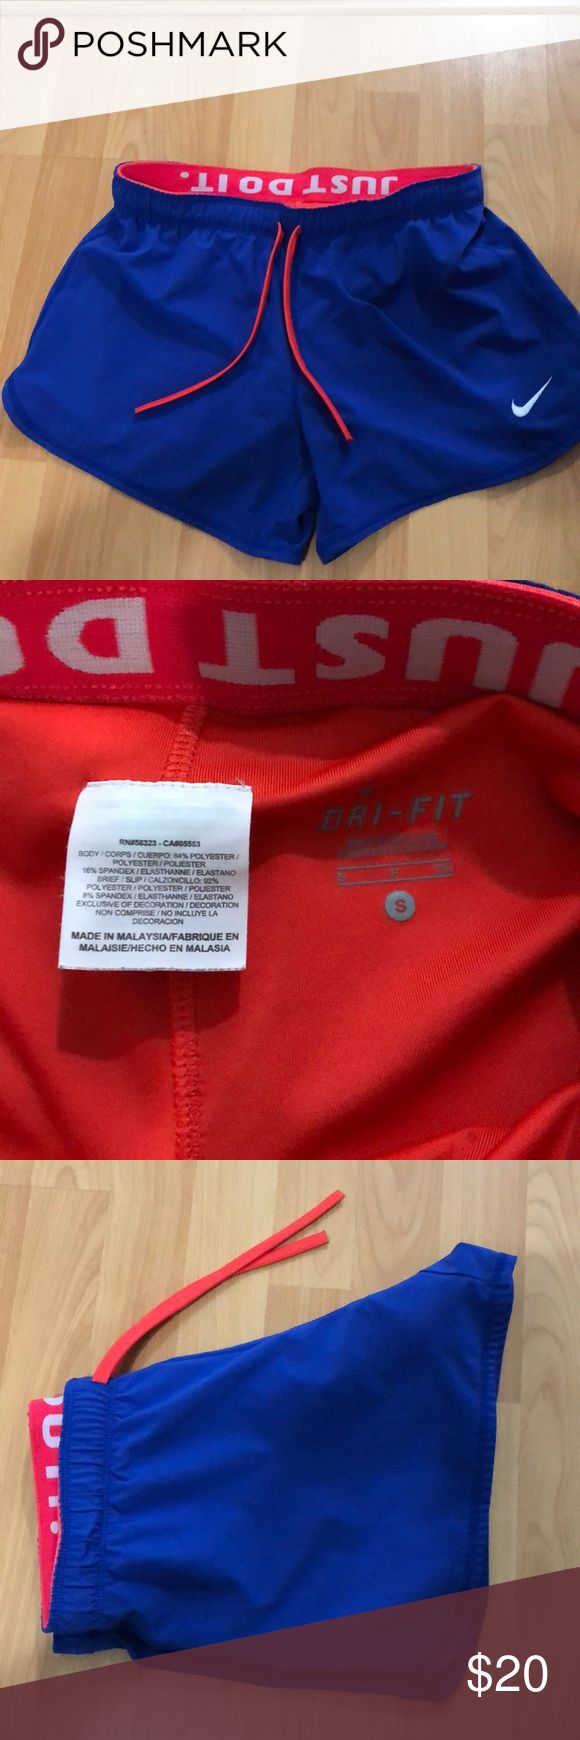 Kleine Nike Athletic Shorts Königsblau und Orange Nike Athletic Nike Shorts. Exce …   – My Posh Picks